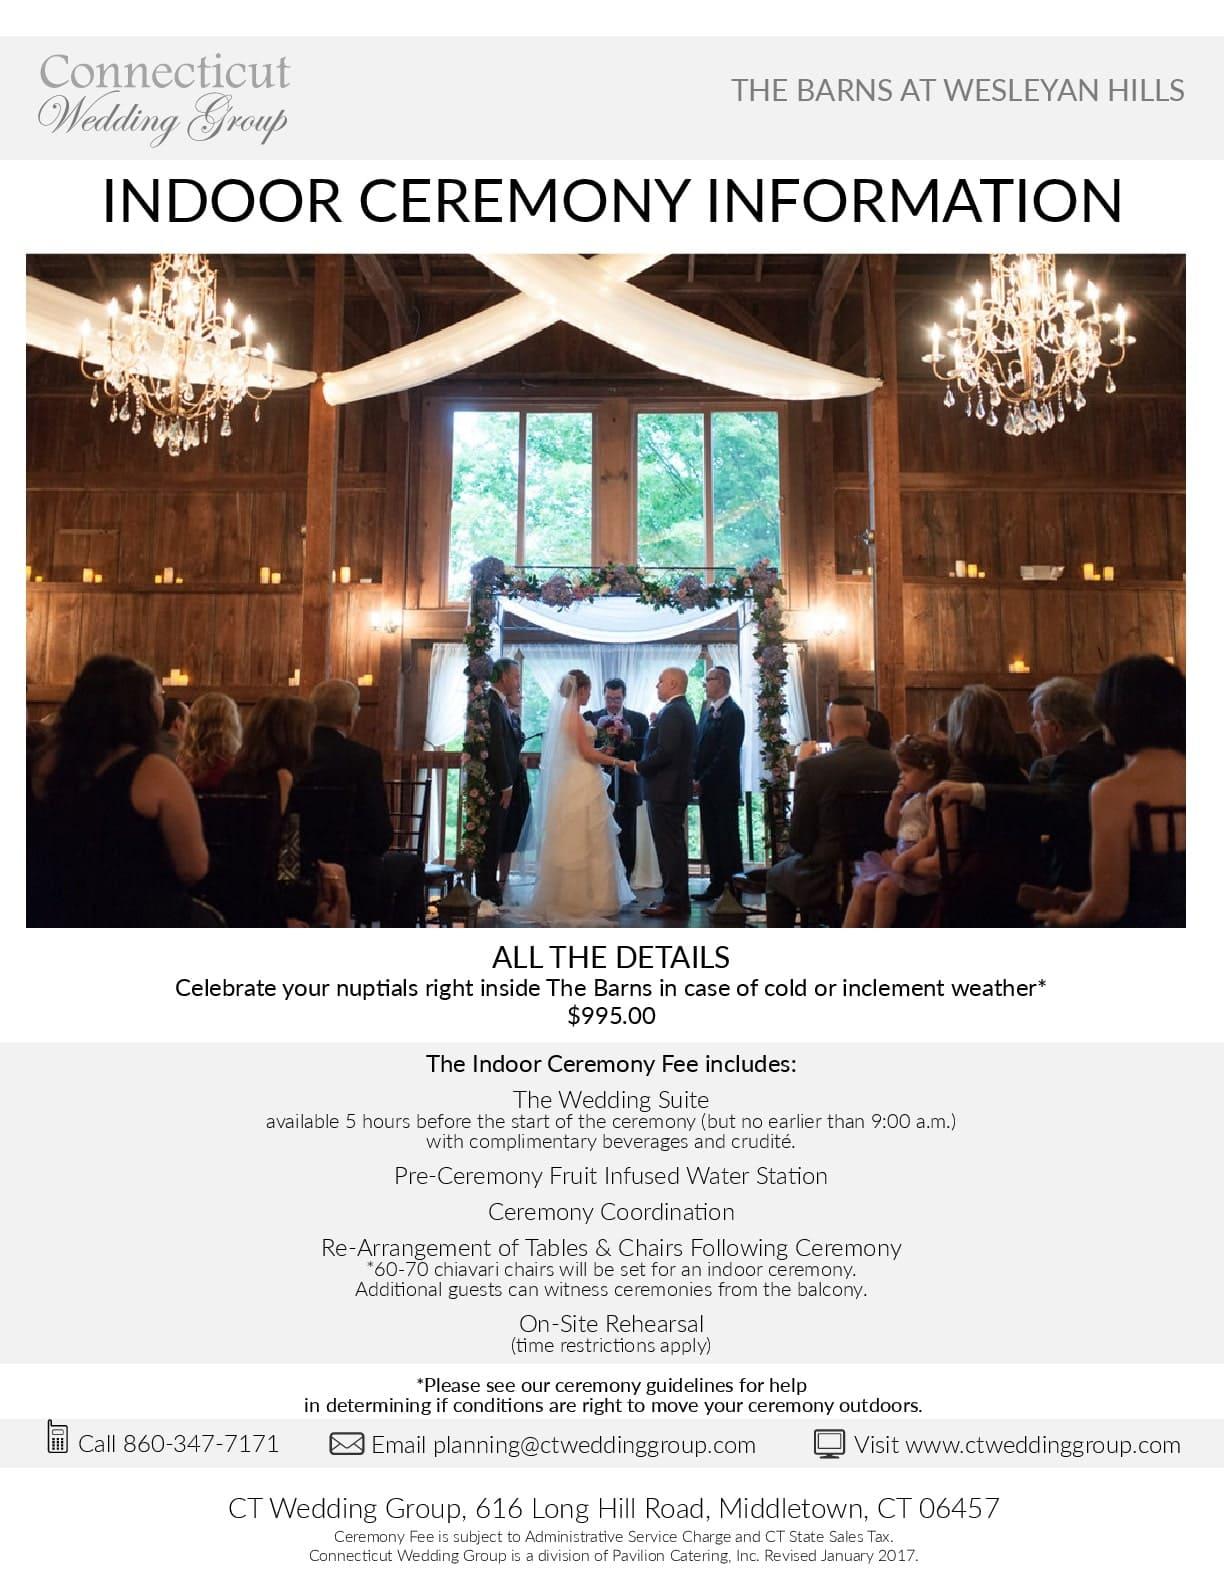 117_15308_Ceremony-Fee-Information_Barns_2018-002-min